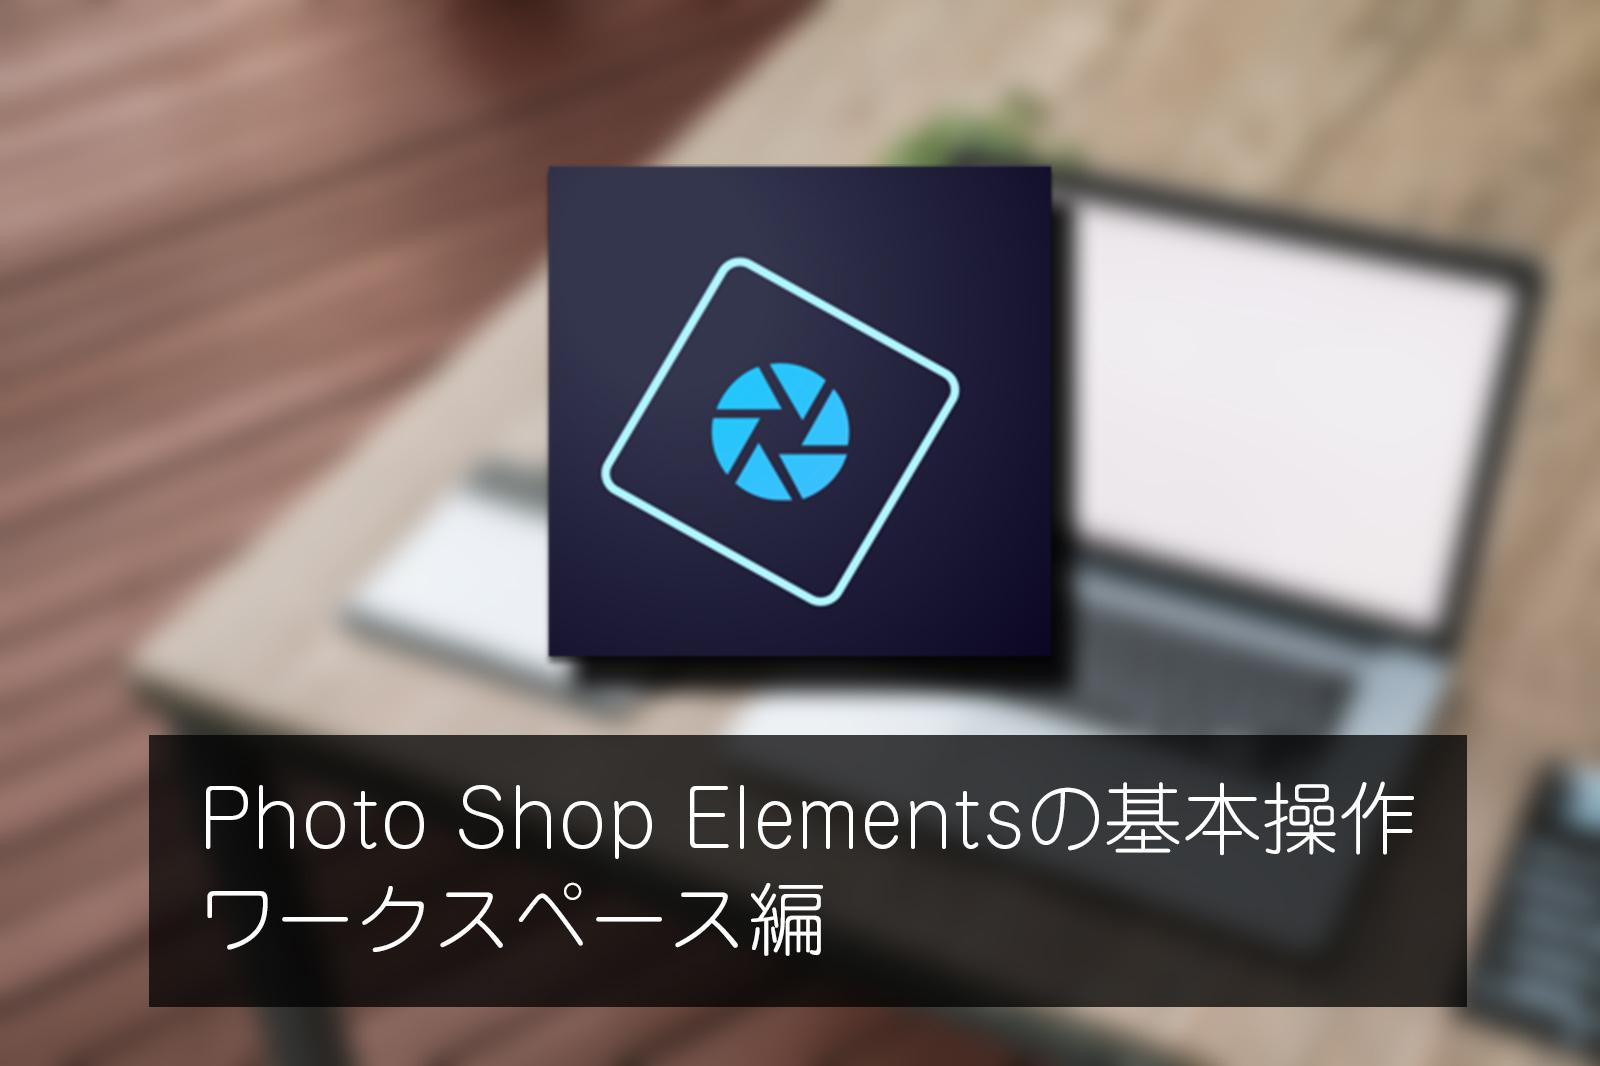 photoshop_elementu_howto_trimming